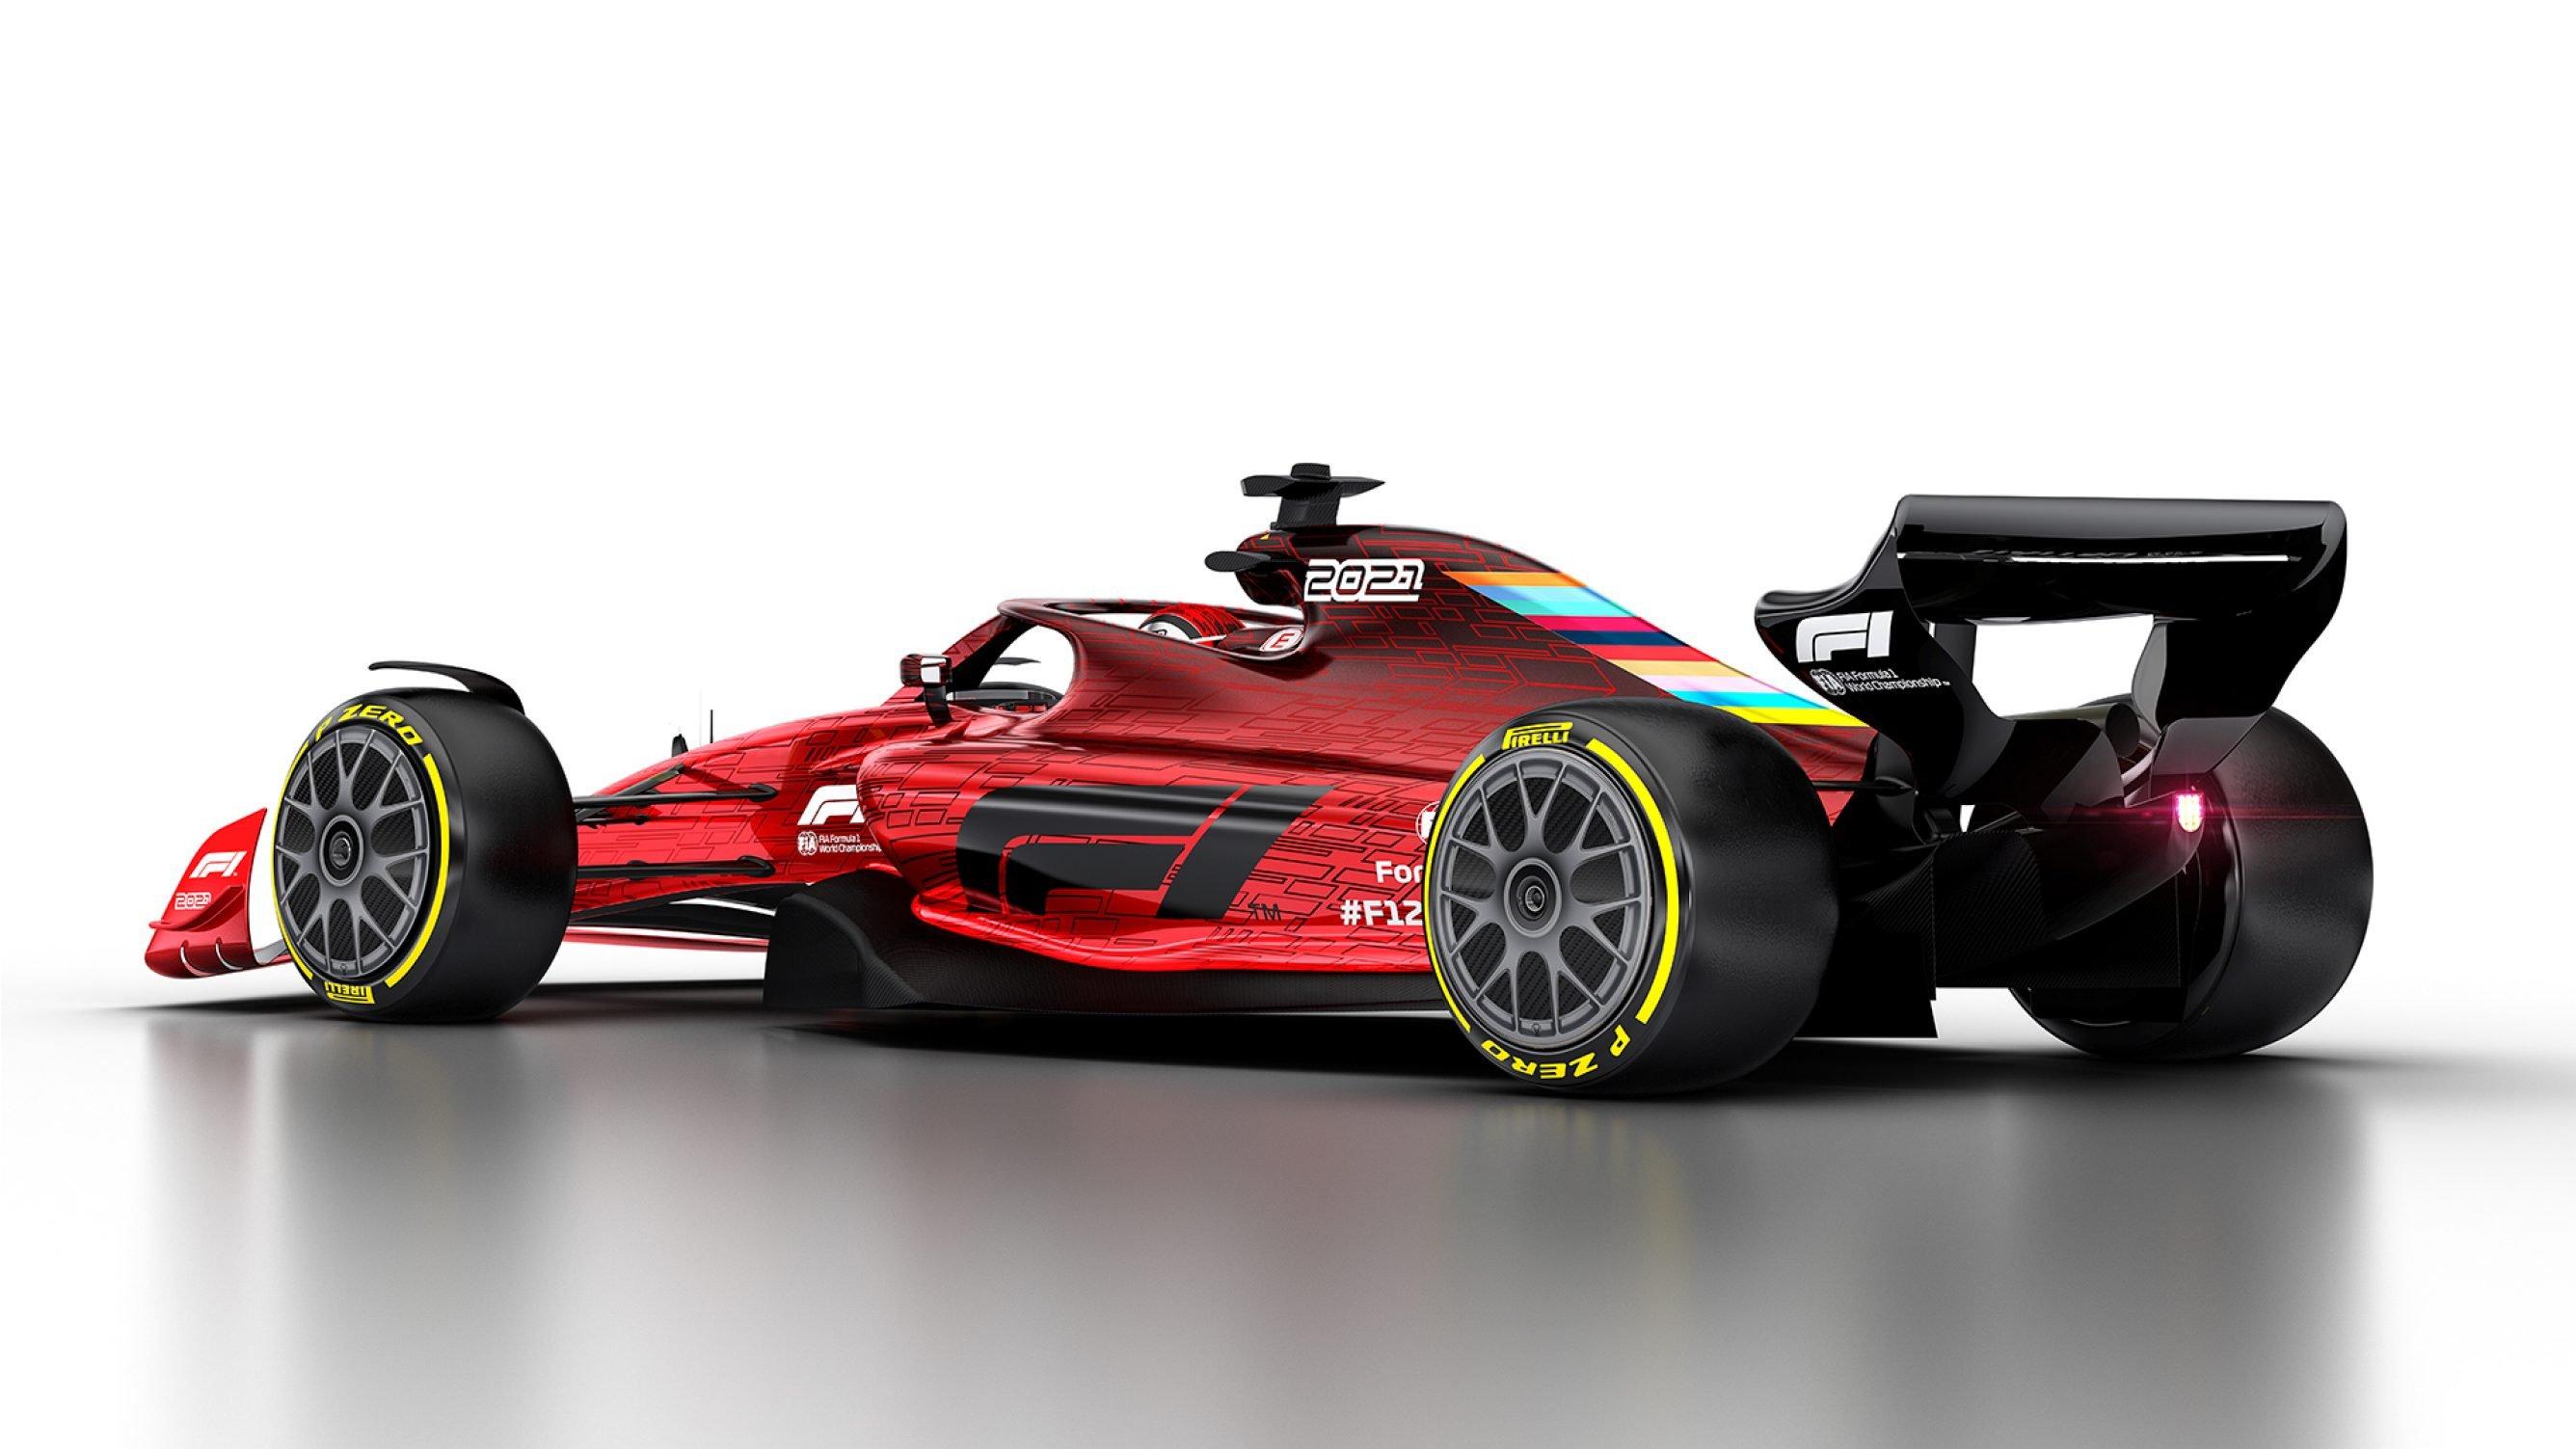 2021 Formula One car photo